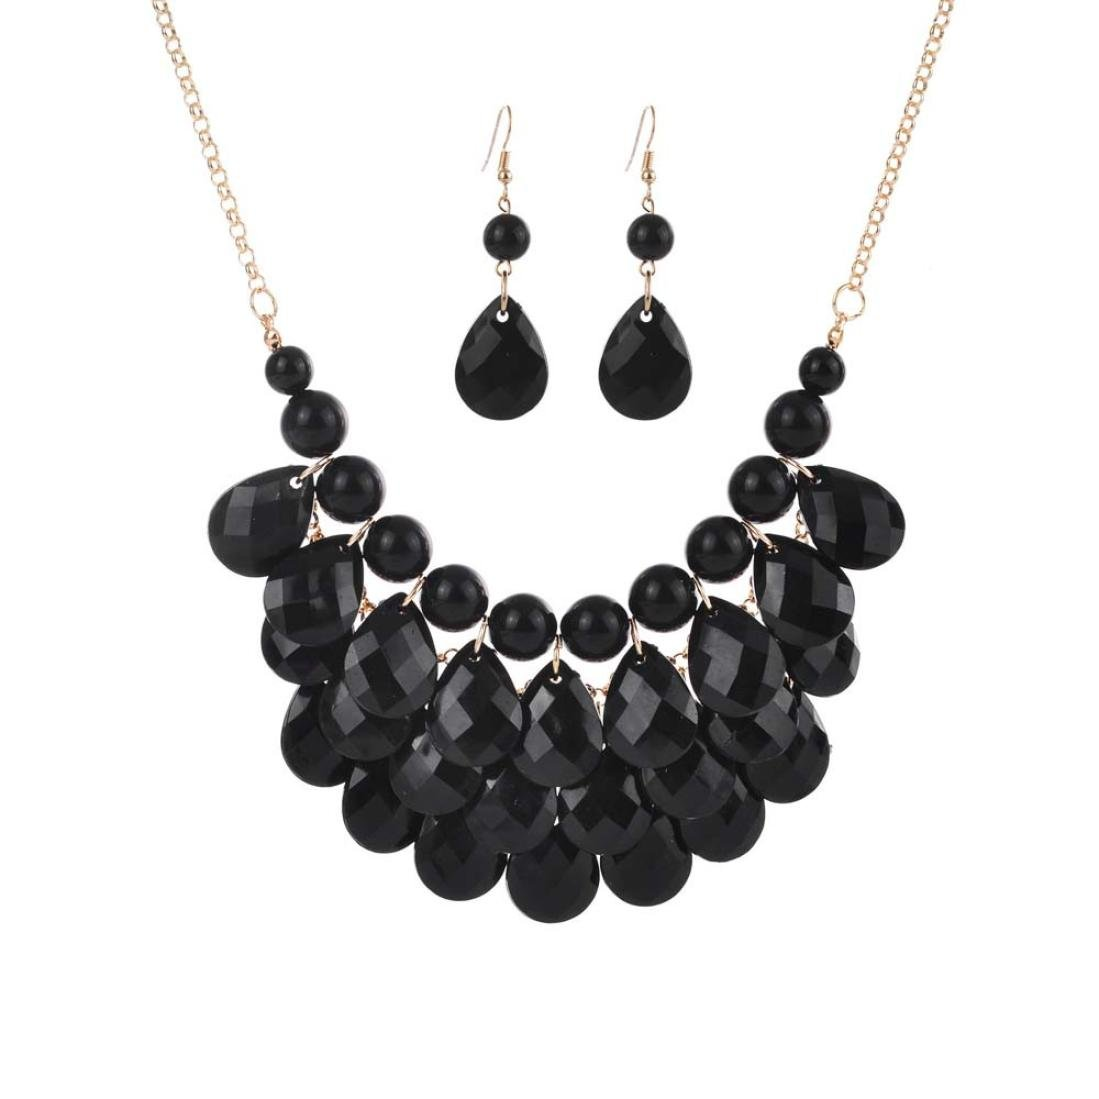 08c9ecaf8 Amazon.com: Botrong® Women Fashion Crystal Necklace Jewelry Statement  Pendant Charm Chain Choker (Black): Jewelry